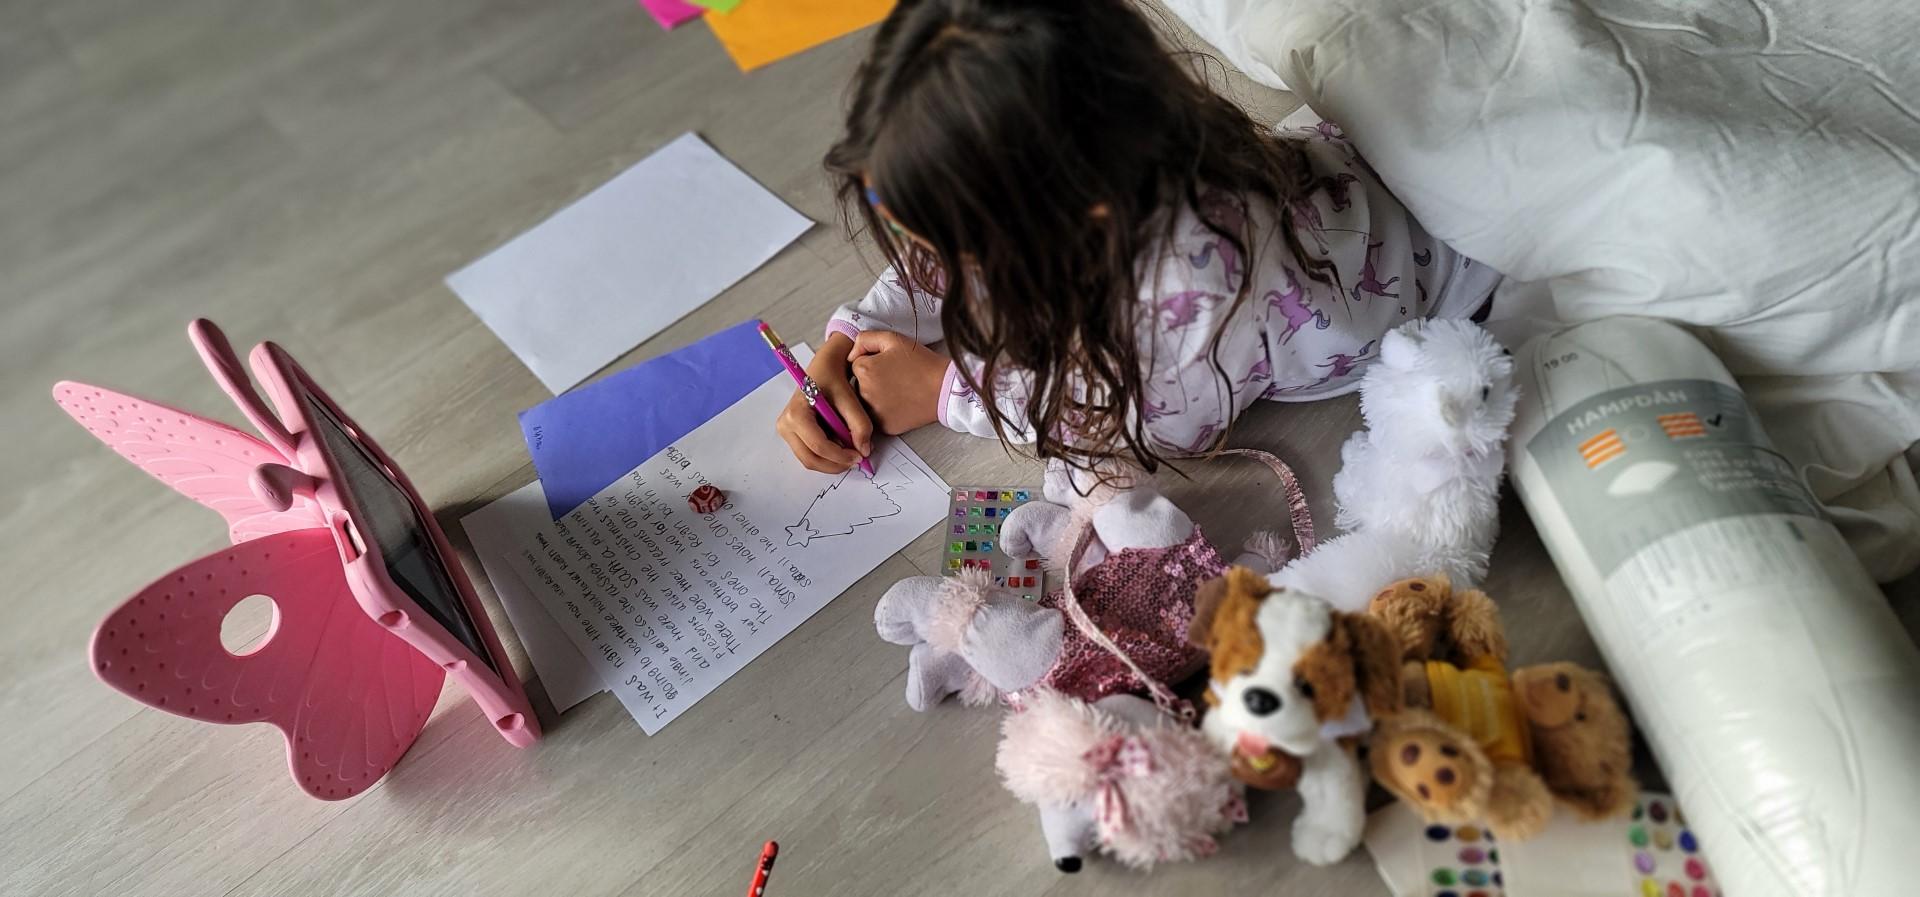 homework during isolation